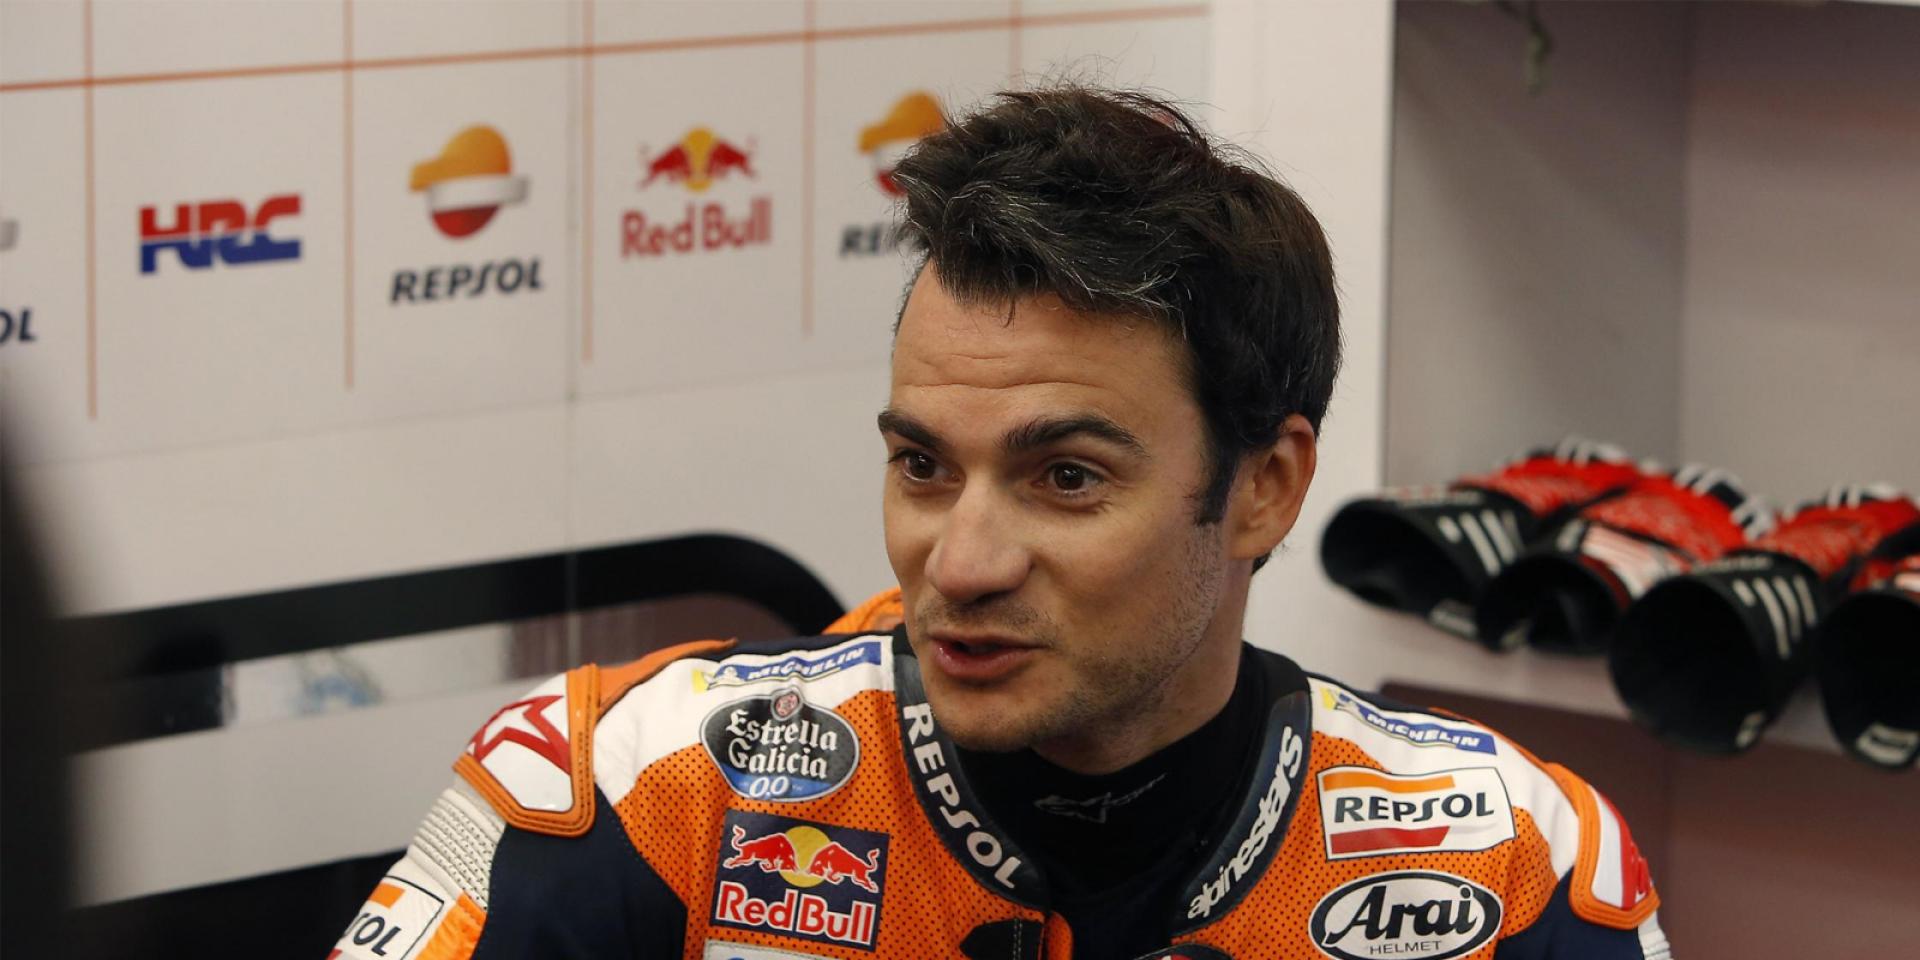 Dani Pedrosa確定加入KTM成為測試車手?車廠間暗地裡的開發角力